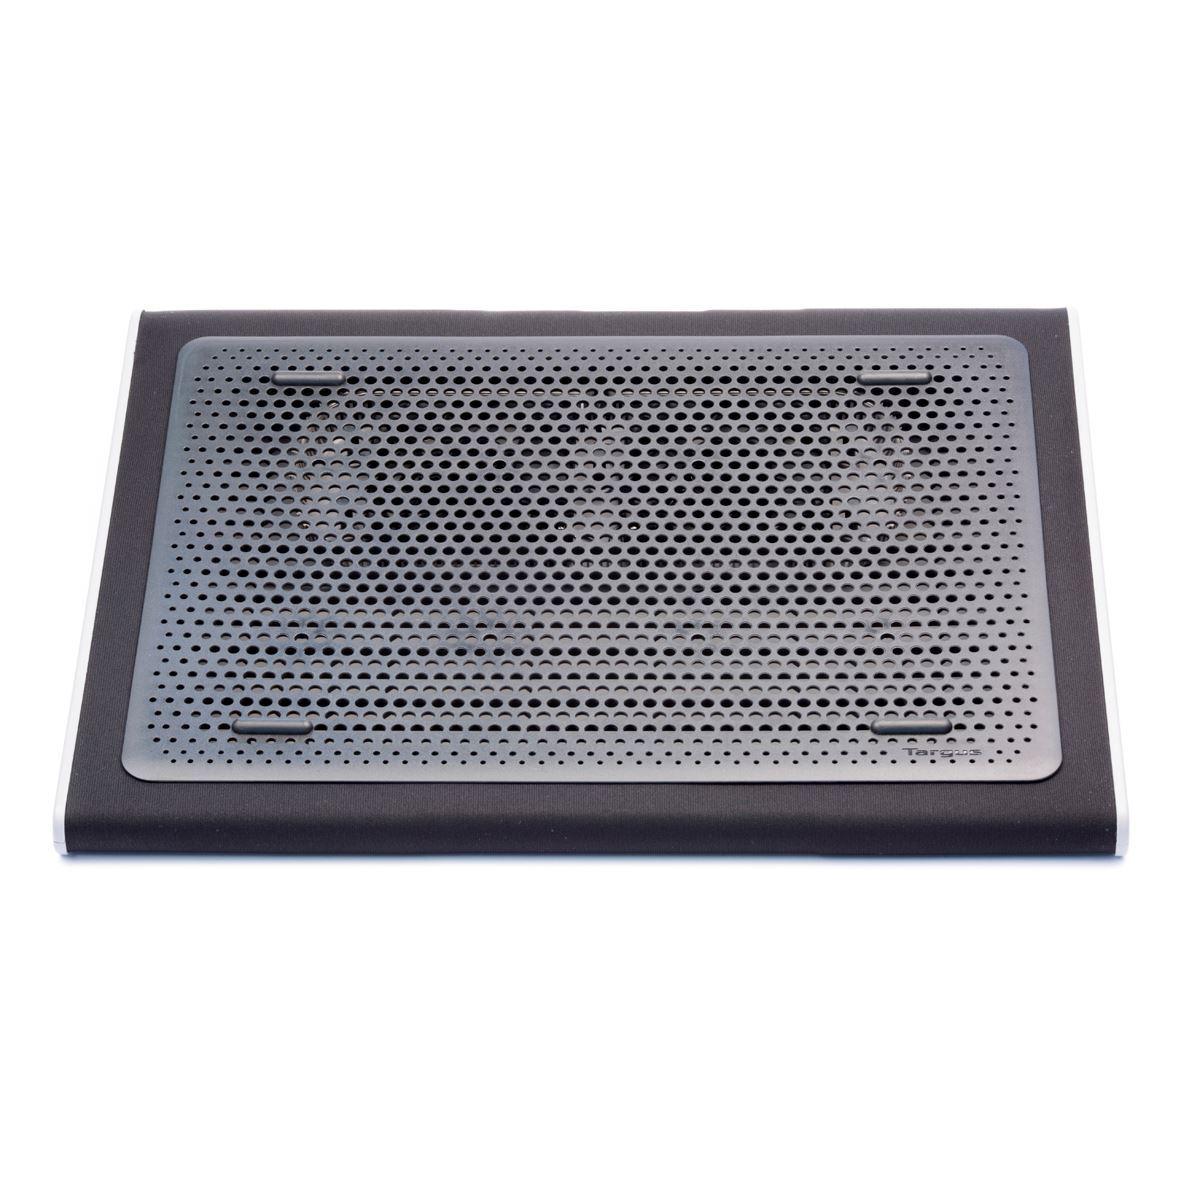 "Targus AWE55GL notebook cooling pad 43.2 cm (17"") 1900 RPM Black, Grey"